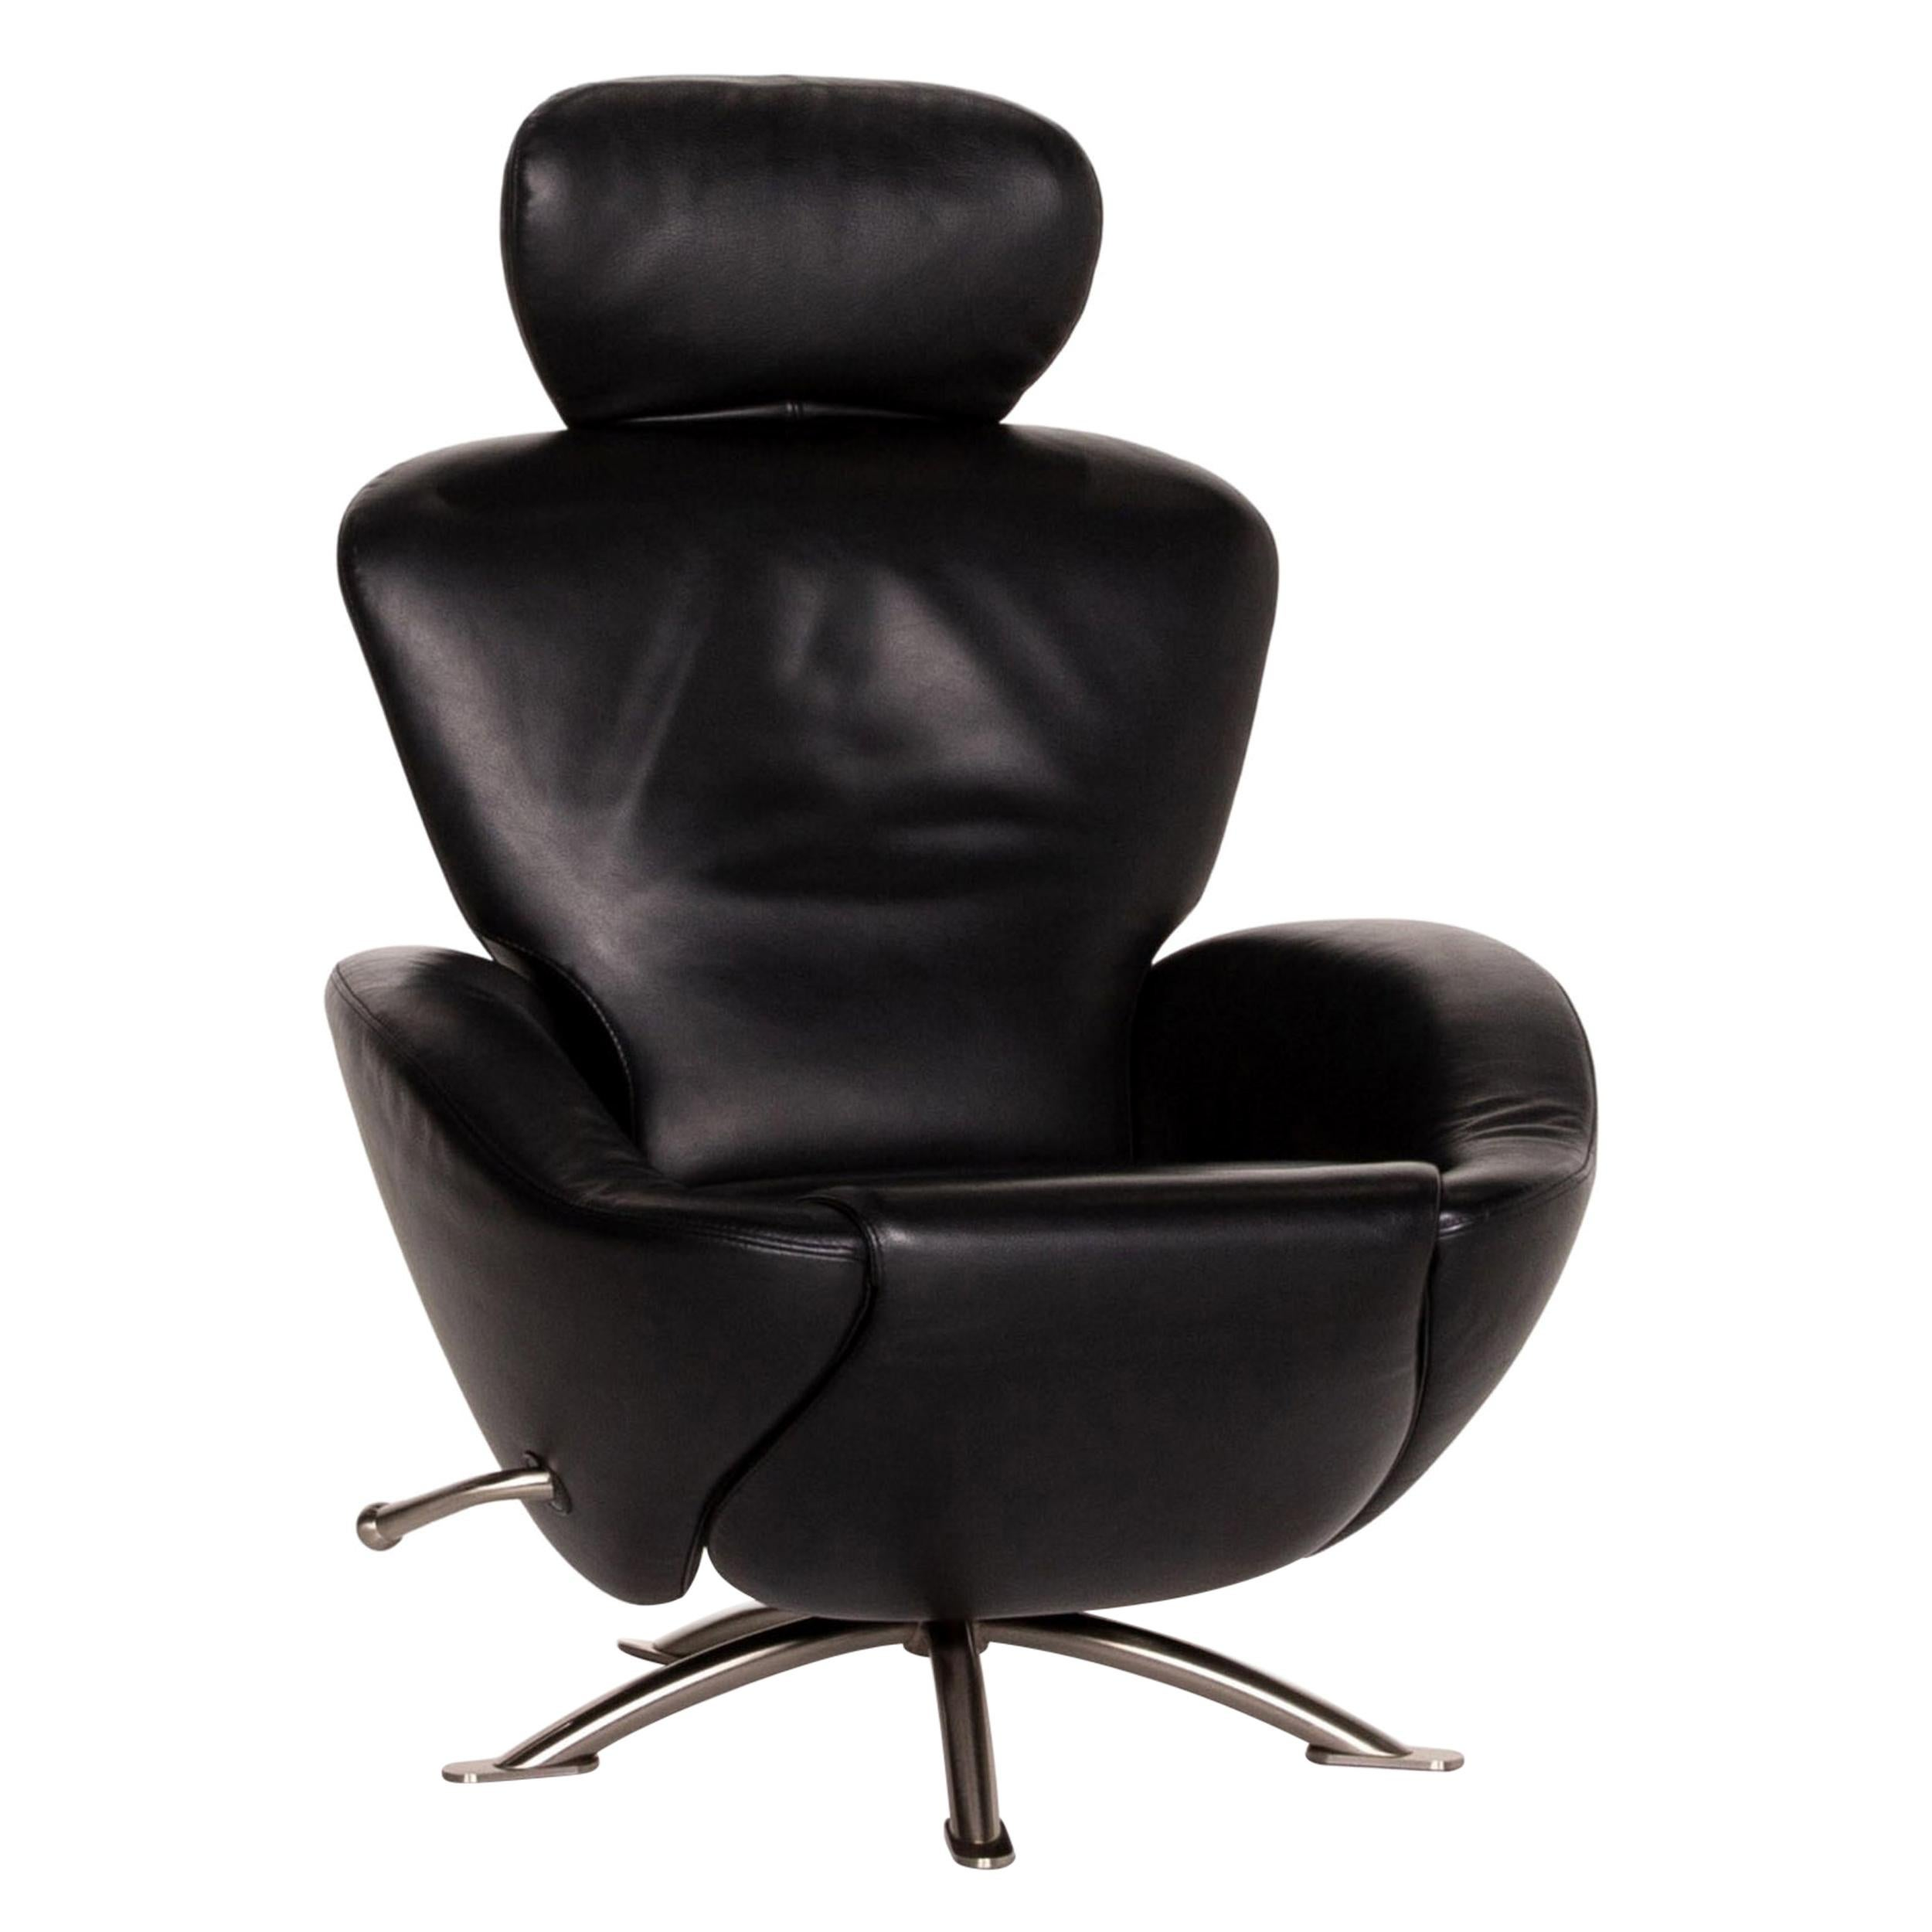 Cassina Dodo Leather Armchair Black Relaxation Function Function Relaxation